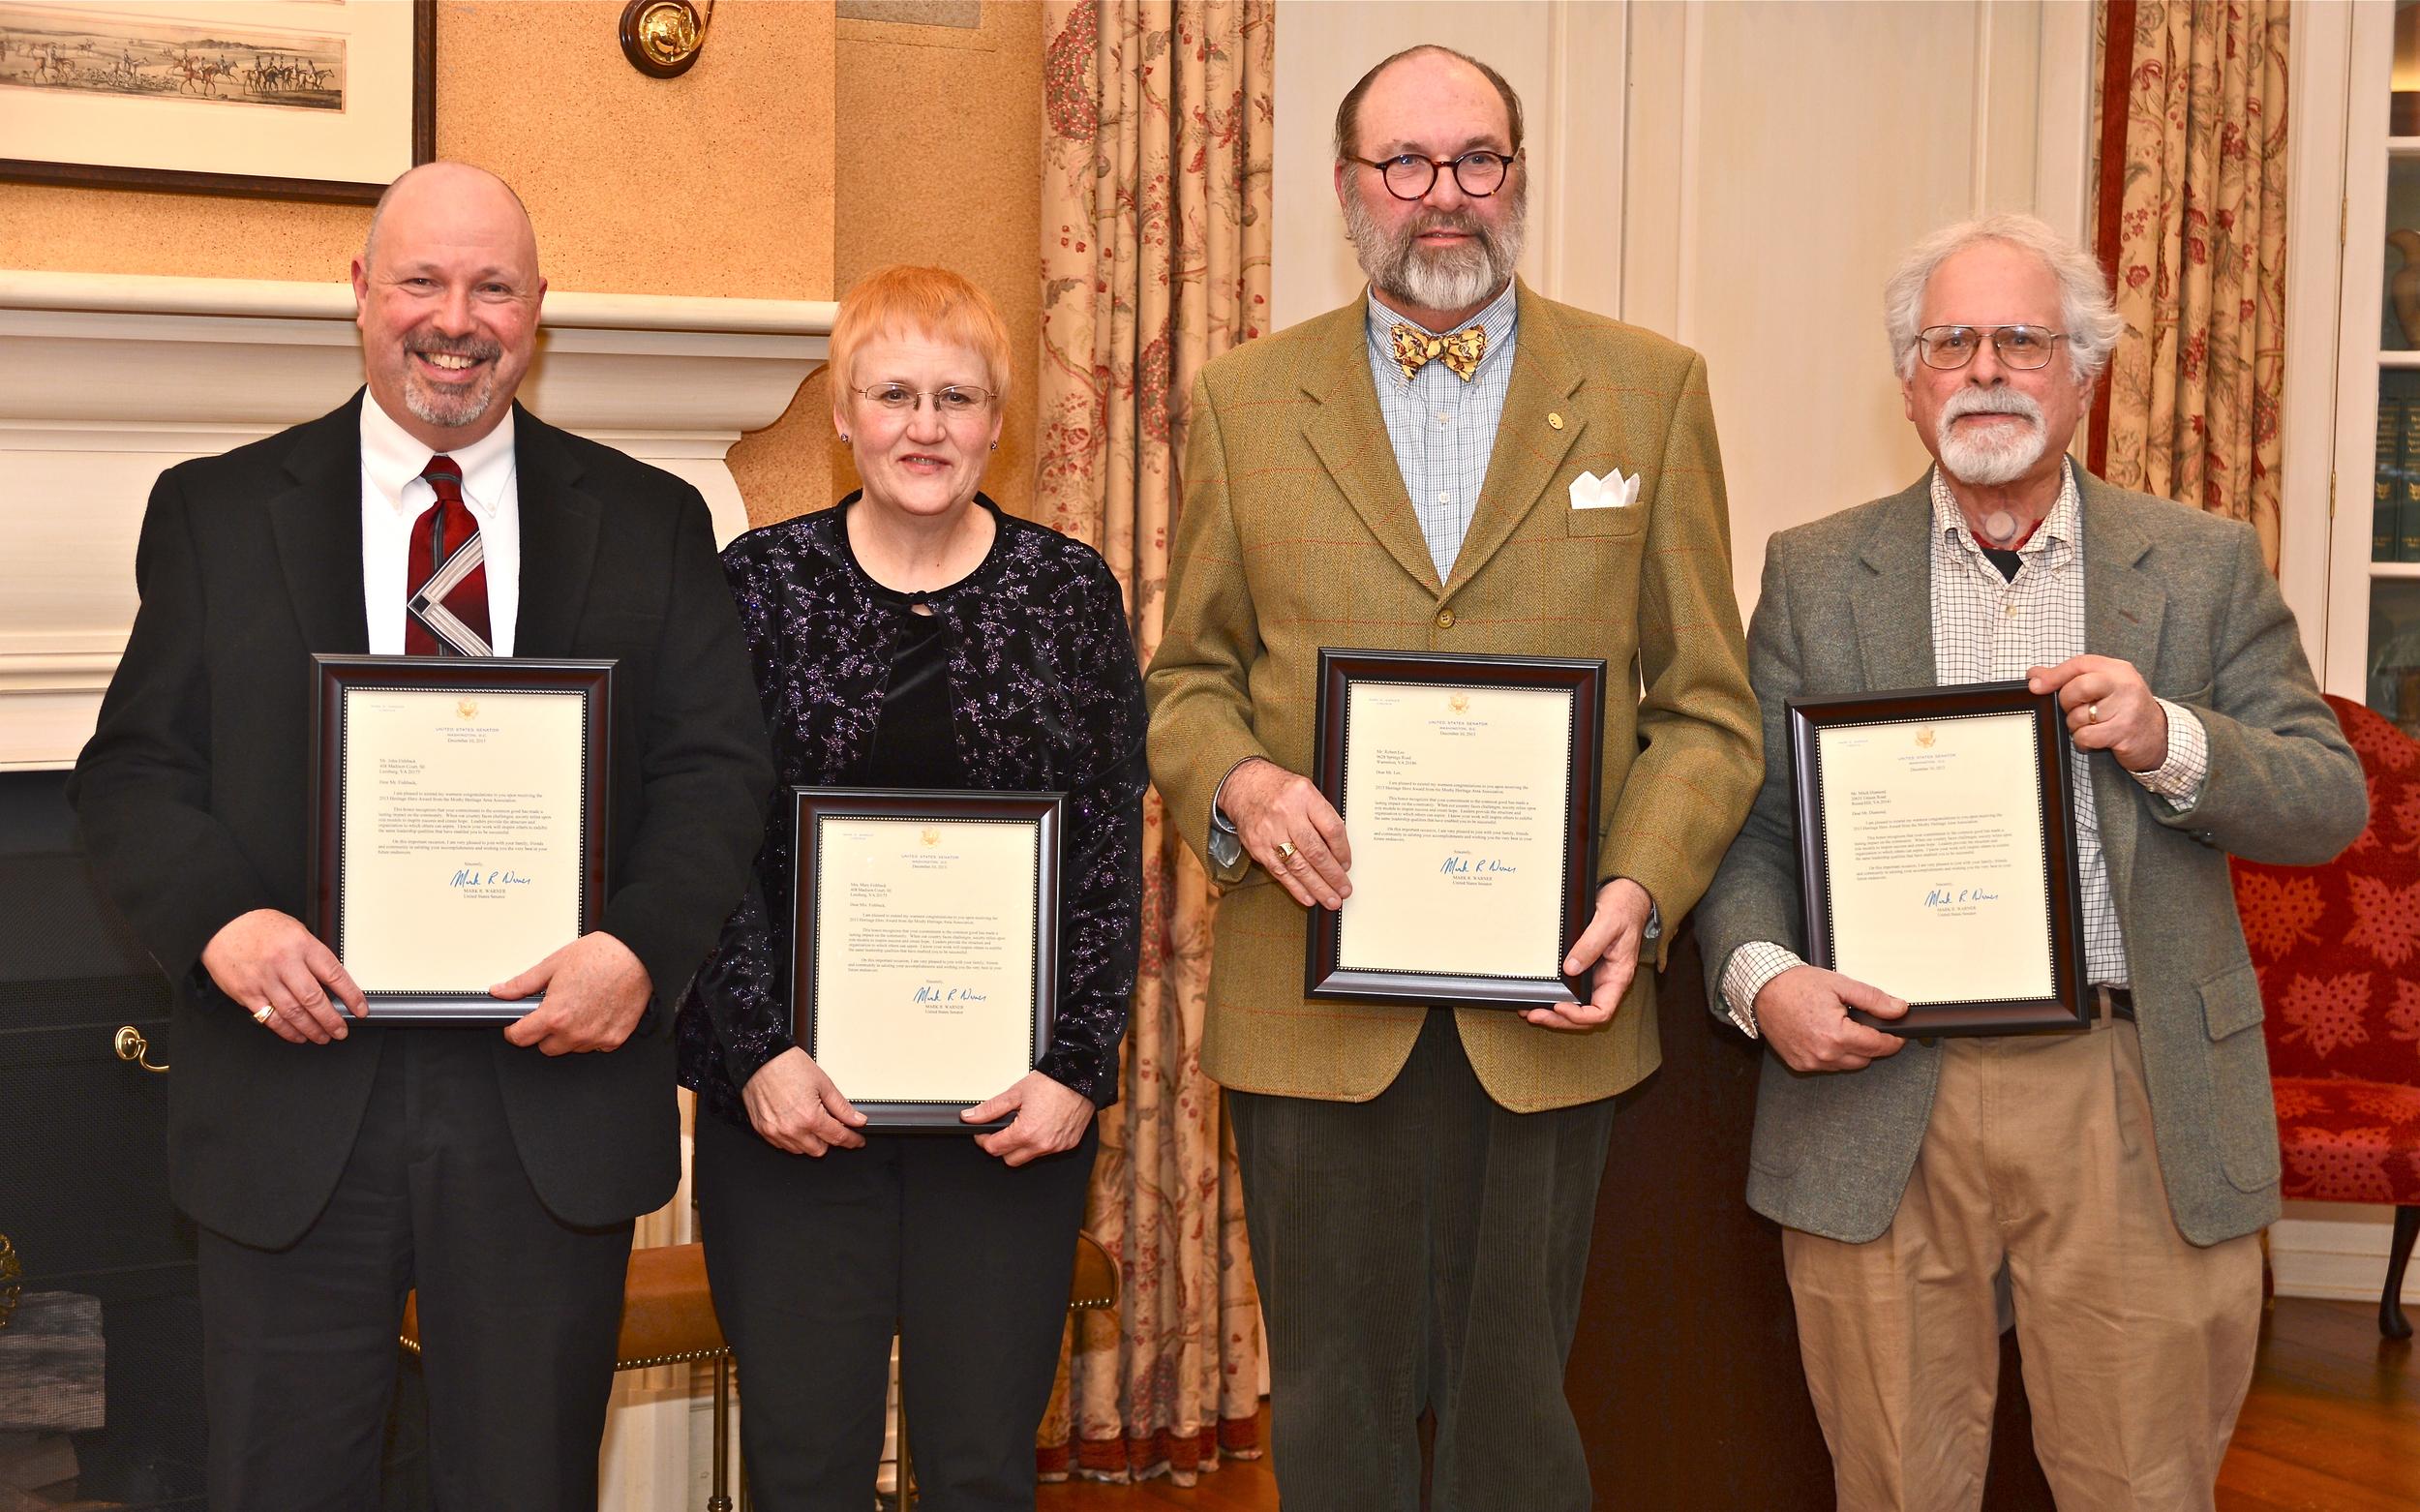 From left: Bob Fishback, Mary Fishback, Bob Lee, Mitch Diamond